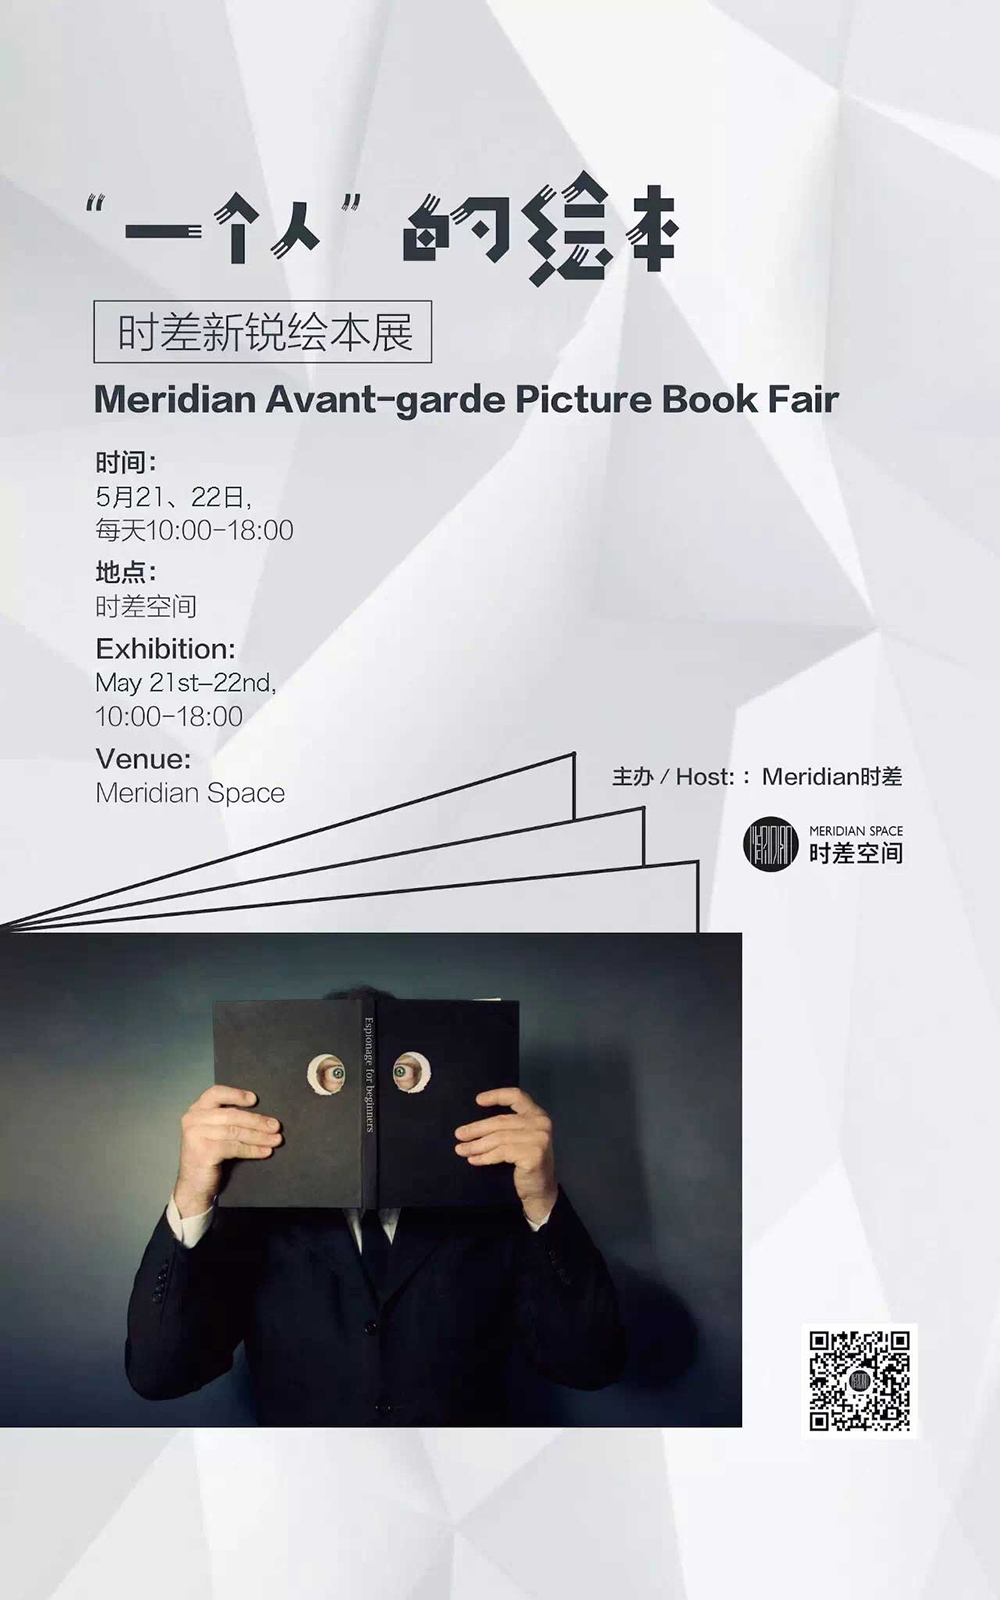 Meridian Avant-garde Picture Book Fair - Meridian Space | Beijing China | May 21-22, 2016Host: Meridian